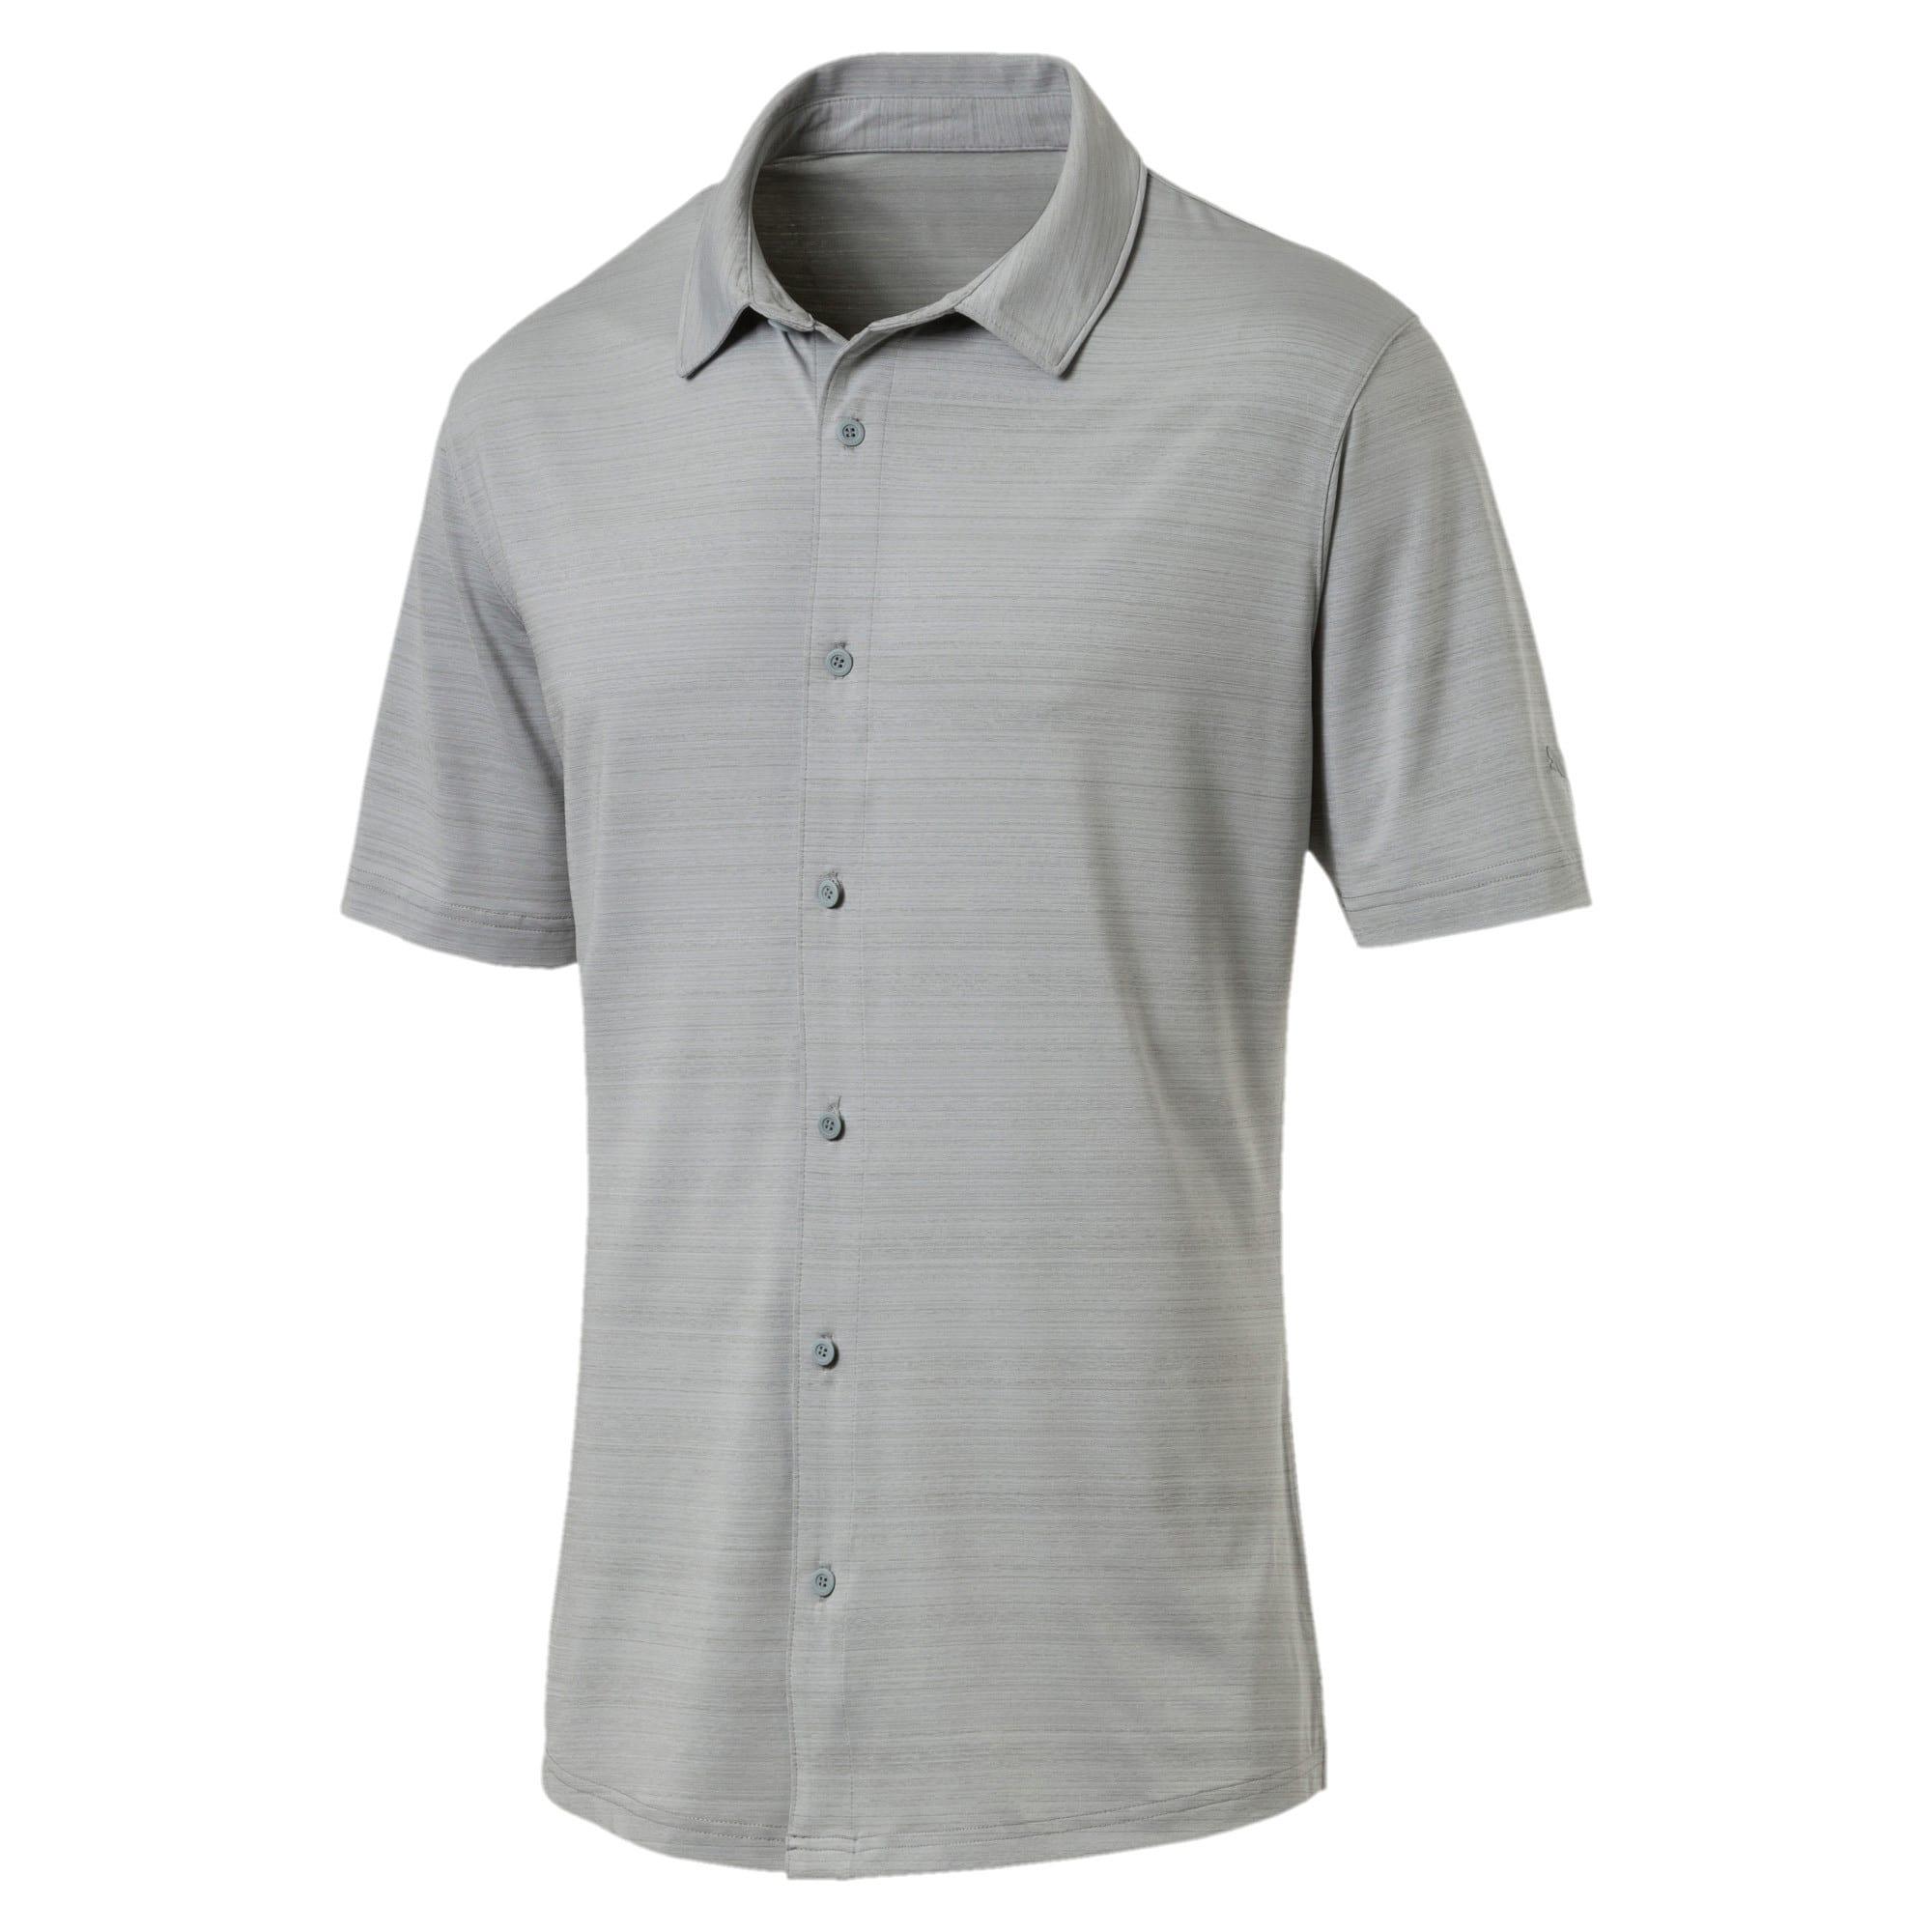 Thumbnail 4 of Breezer Short Sleeve Men's Golf Shirt, Quarry, medium